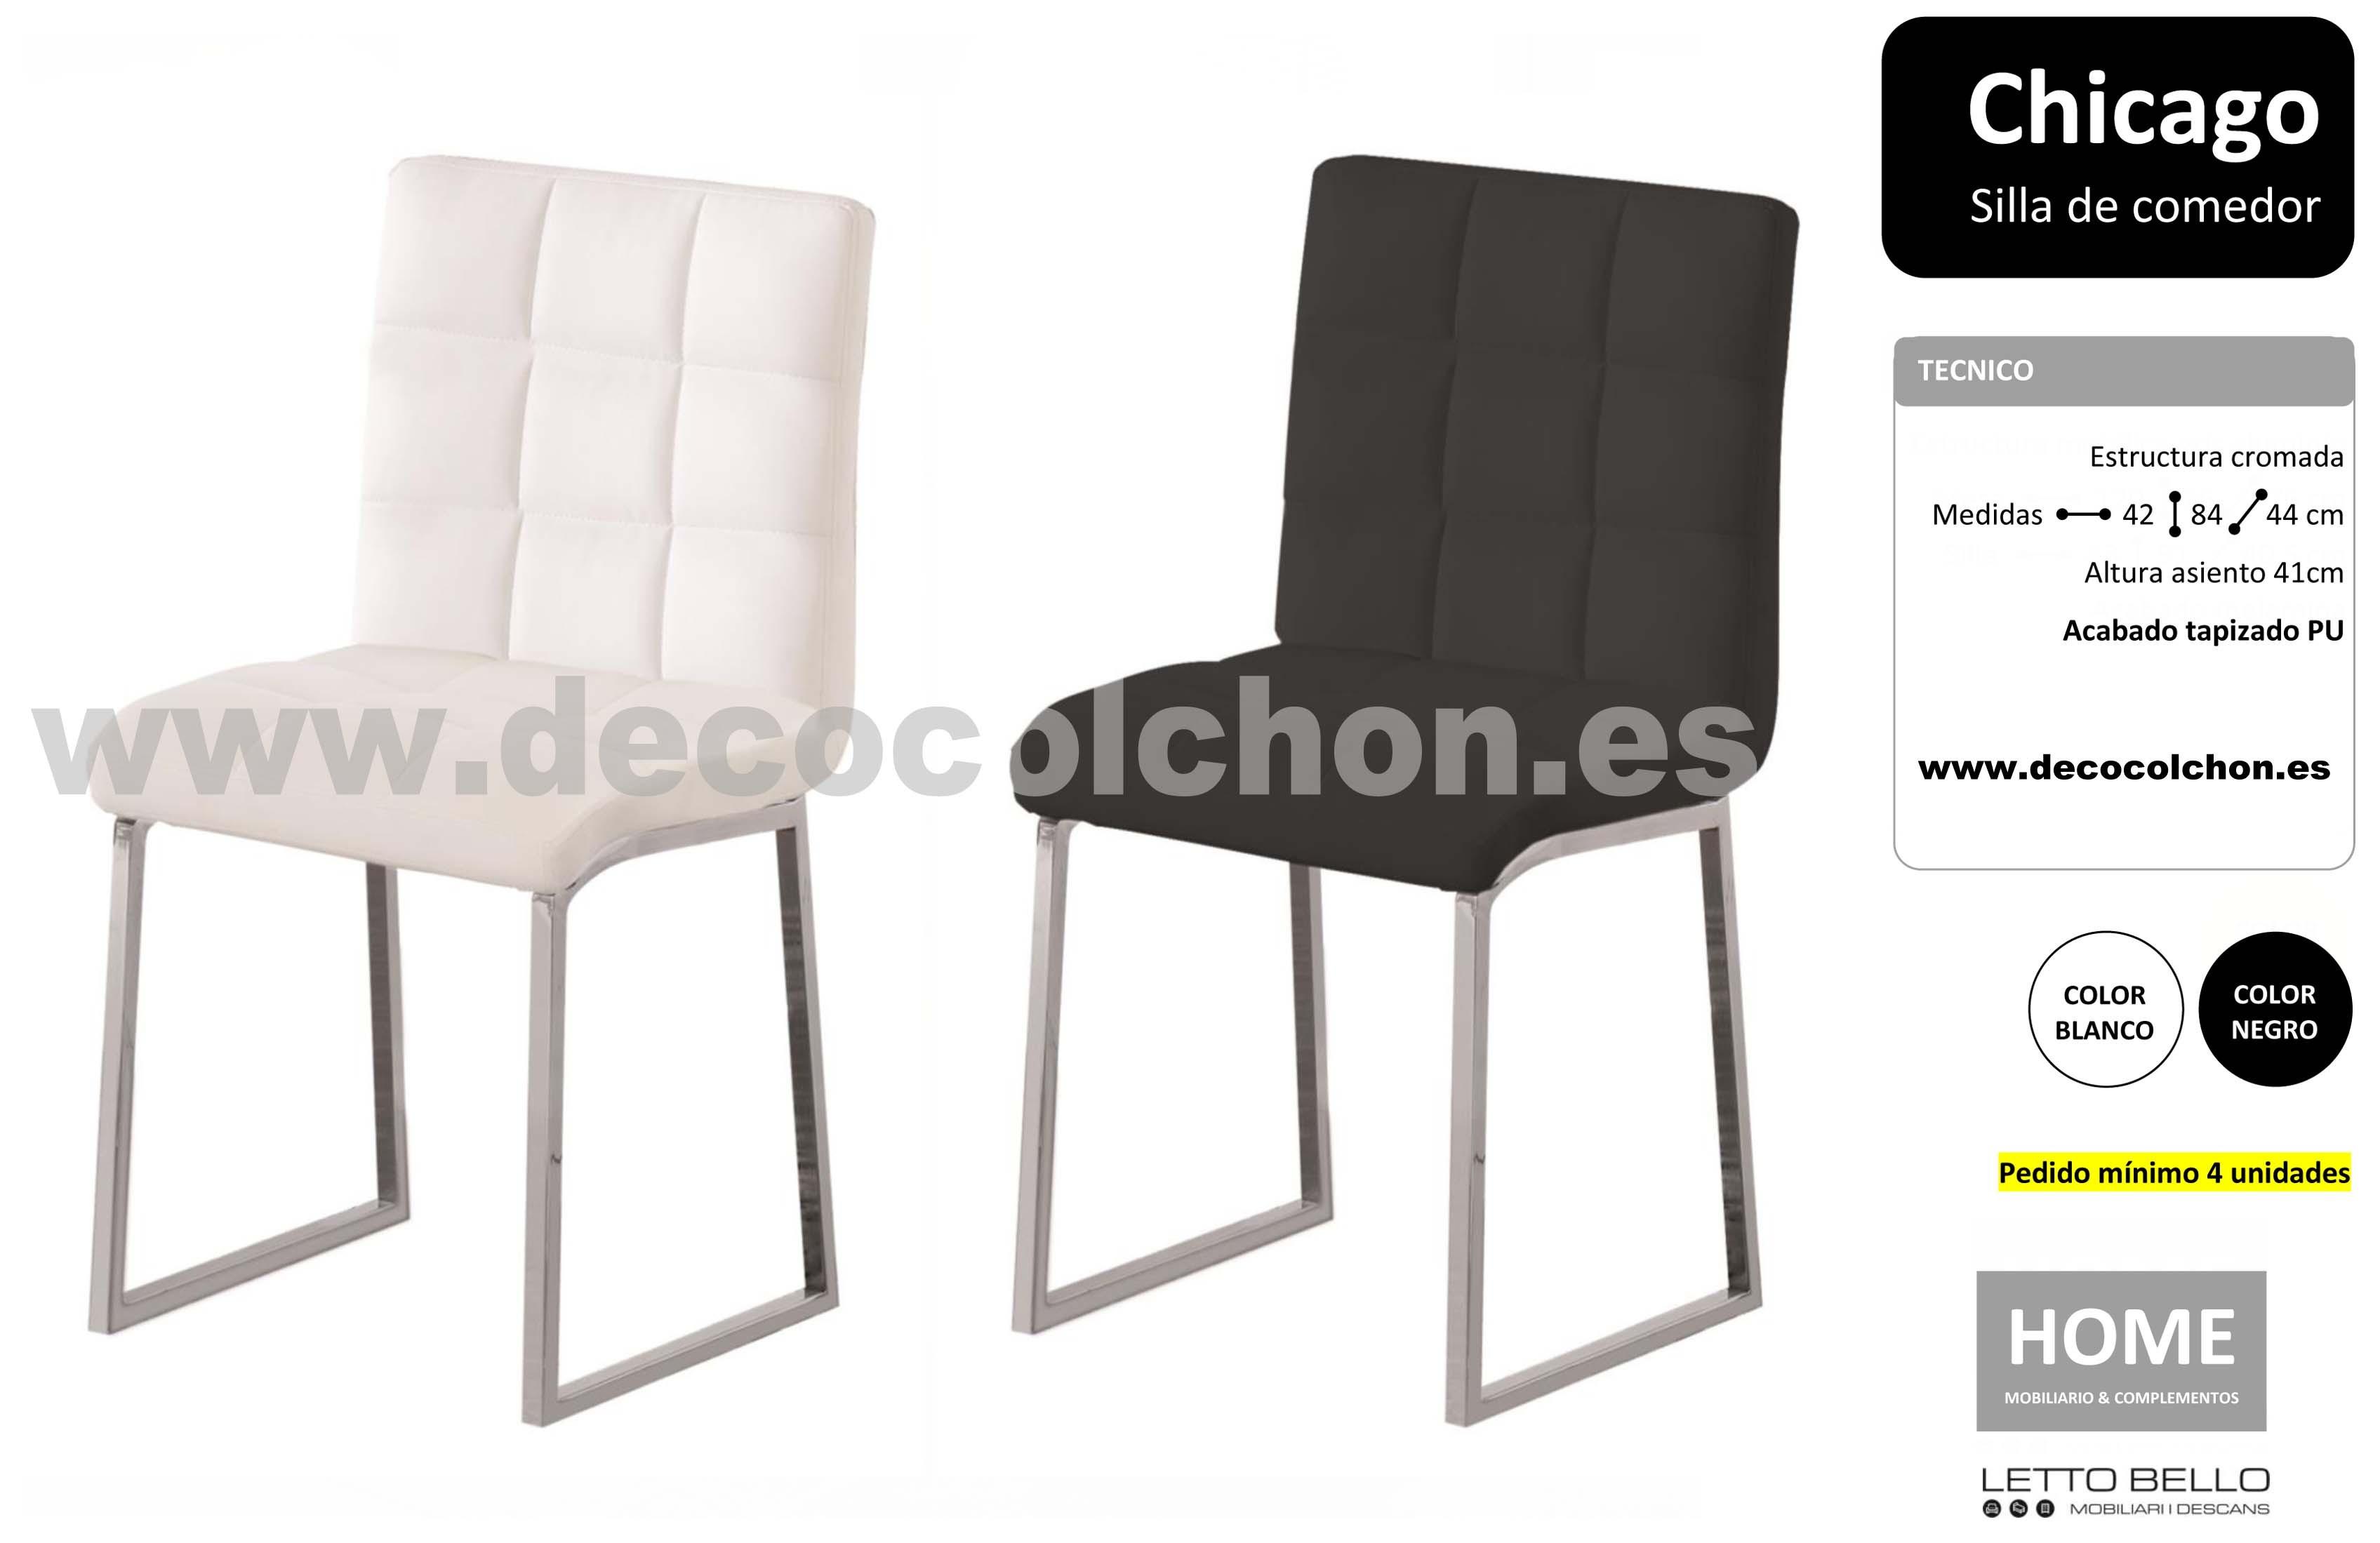 Silla chicago pack 4 unidades decora descans colch n for Pack sillas comedor